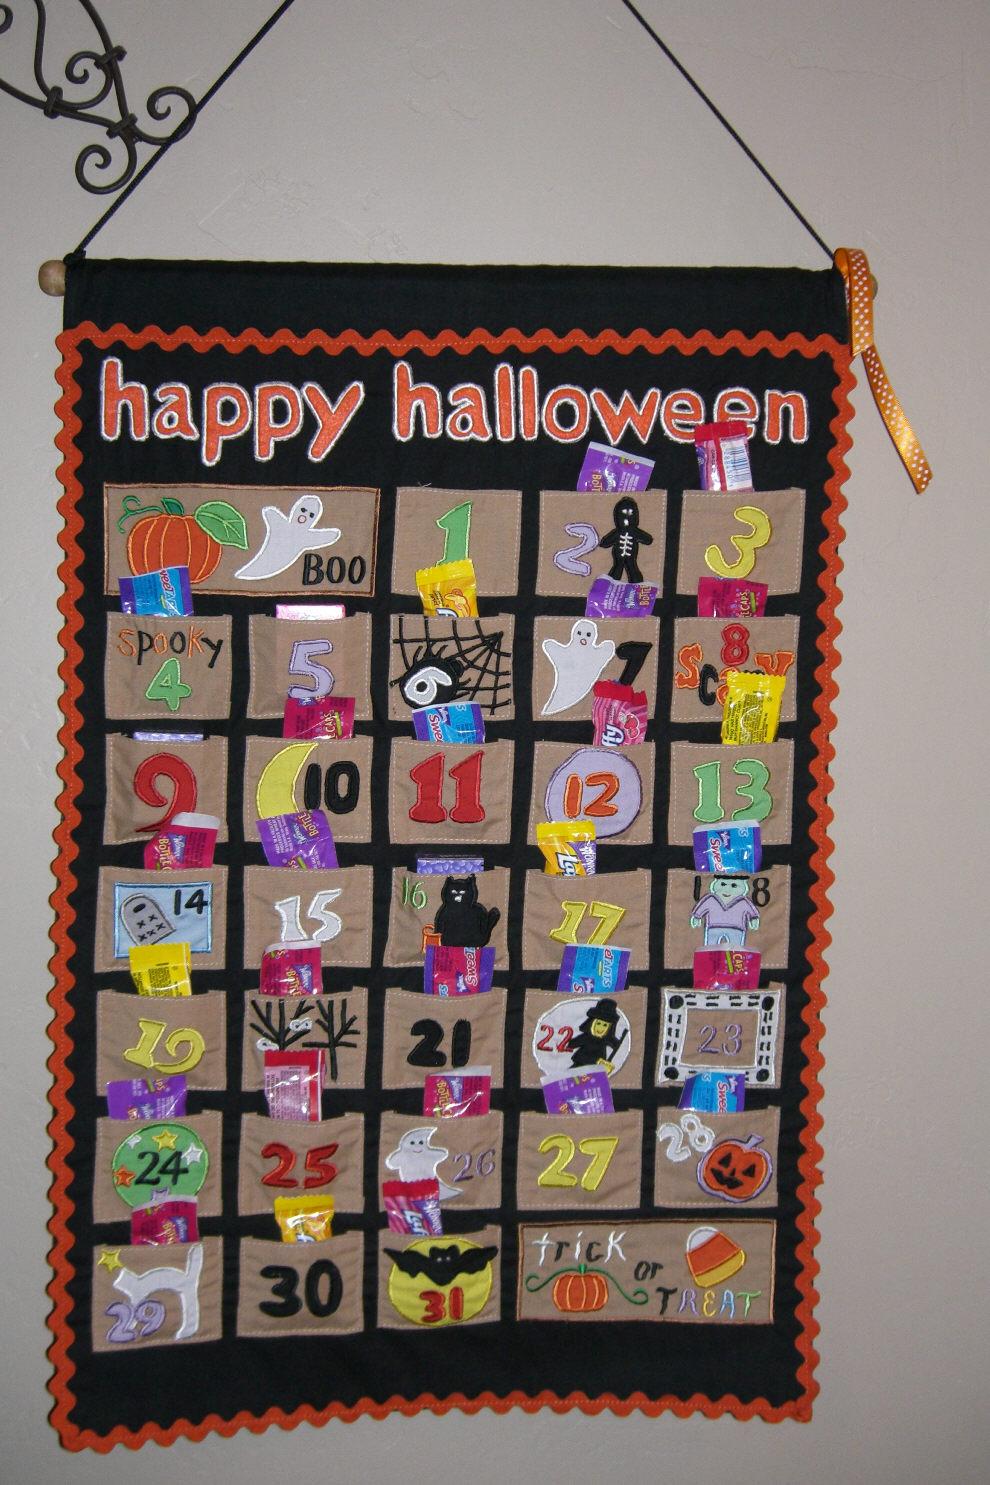 Pish Posh Paperie Halloween Time